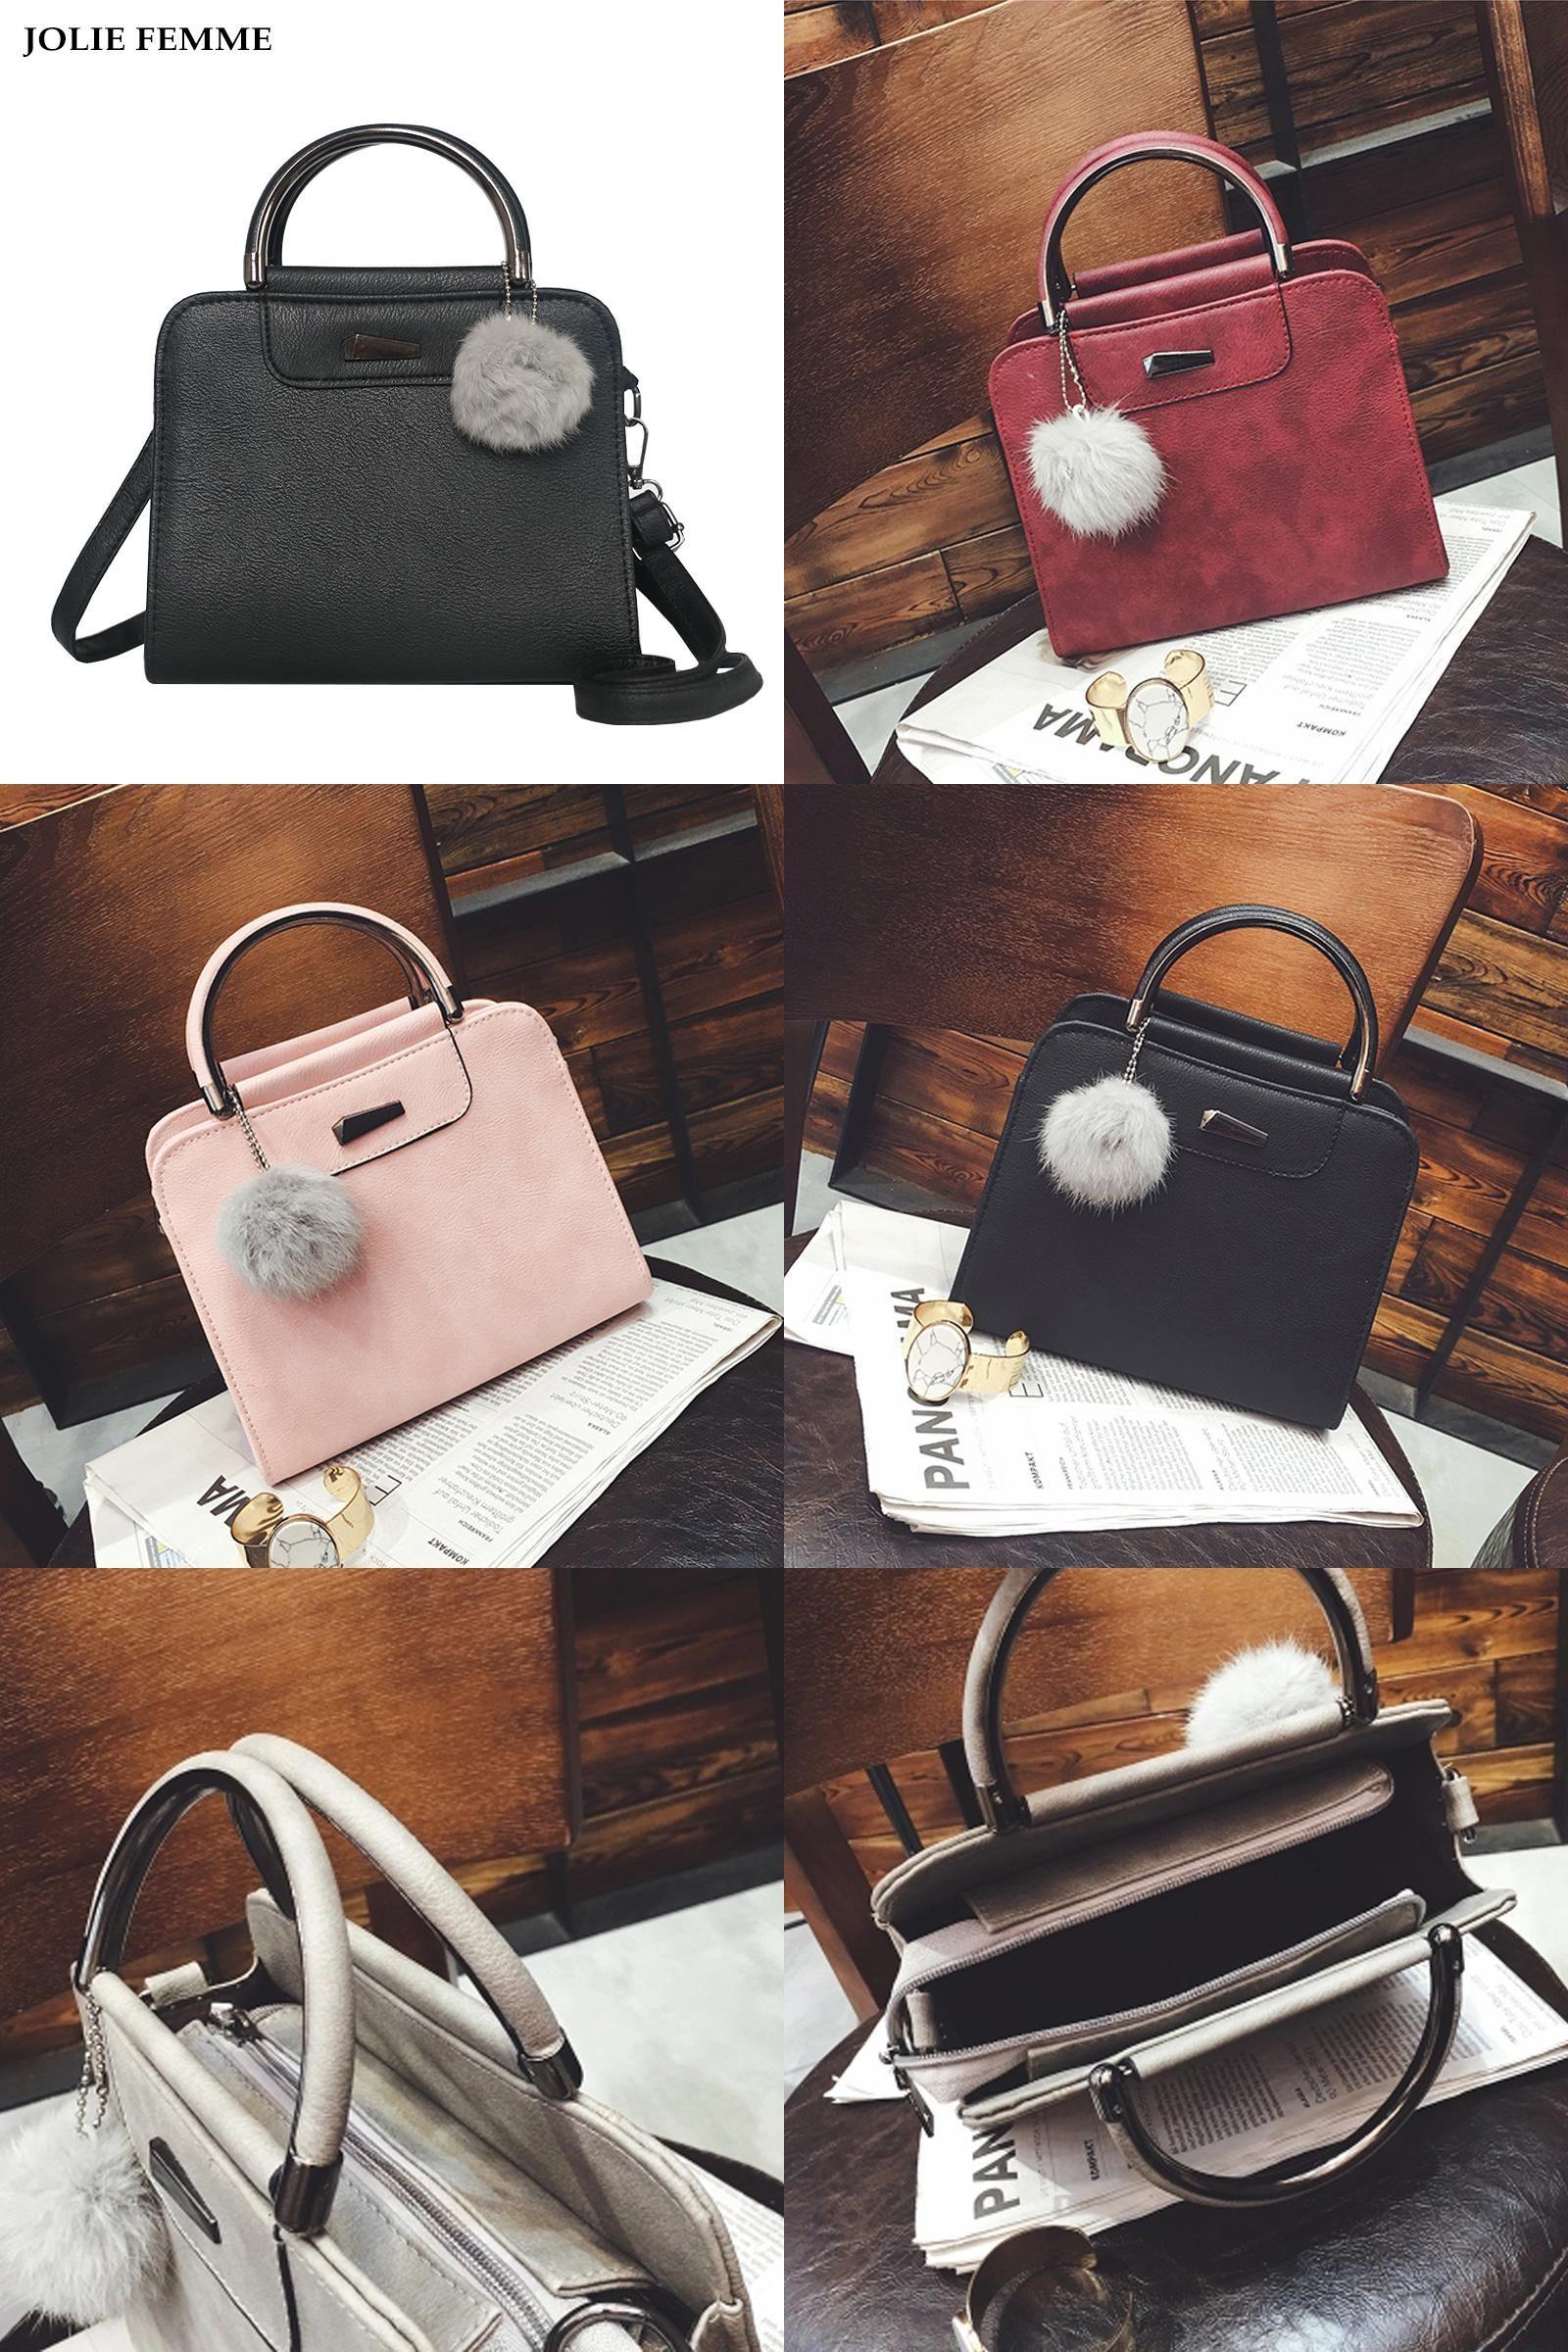 05e2df1d2dc3 Visit to Buy] JOLIE FEMME Korean Women Mini Tote Handbag Small ...